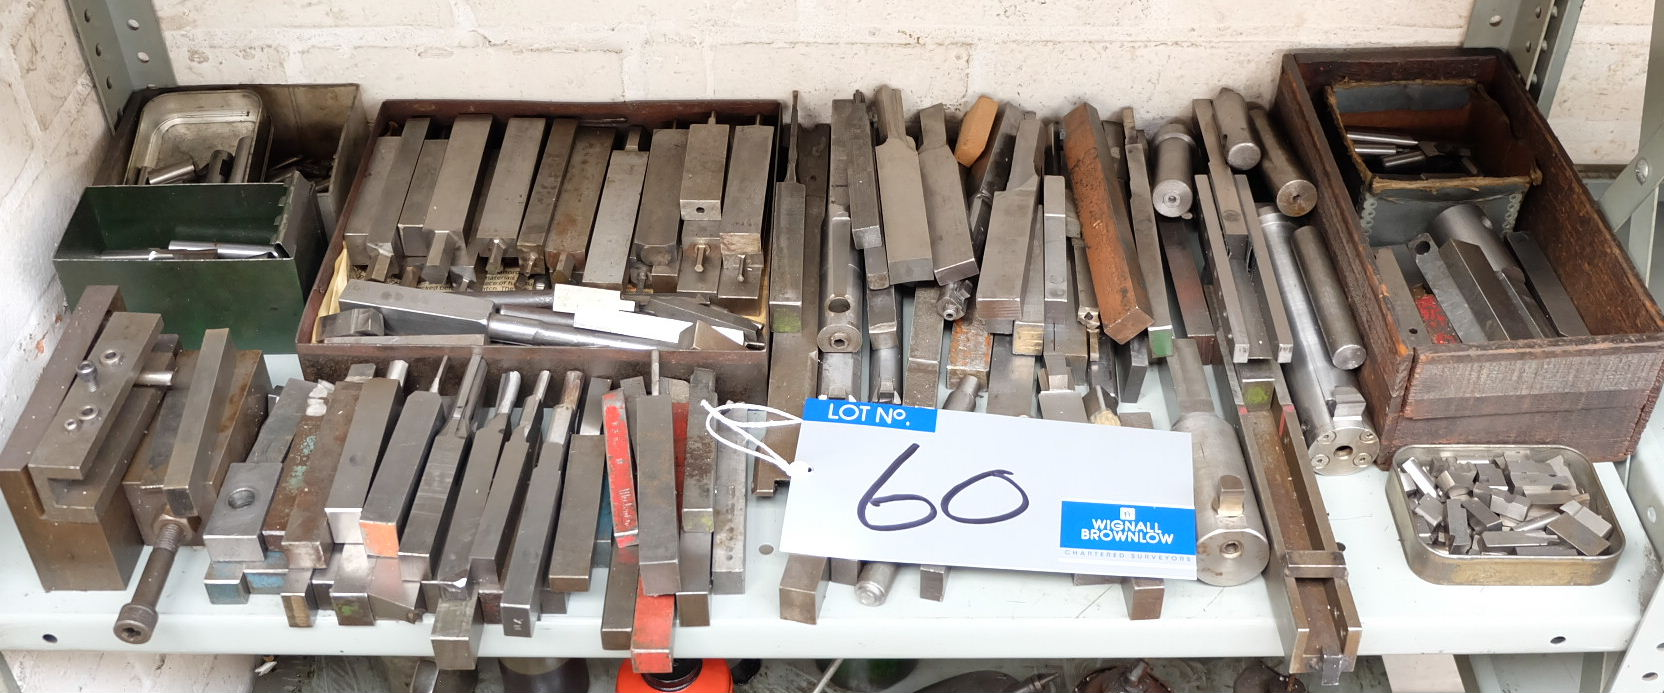 Lot 60 - Miscellaneous Lathe, Boring and Slotting Tools.